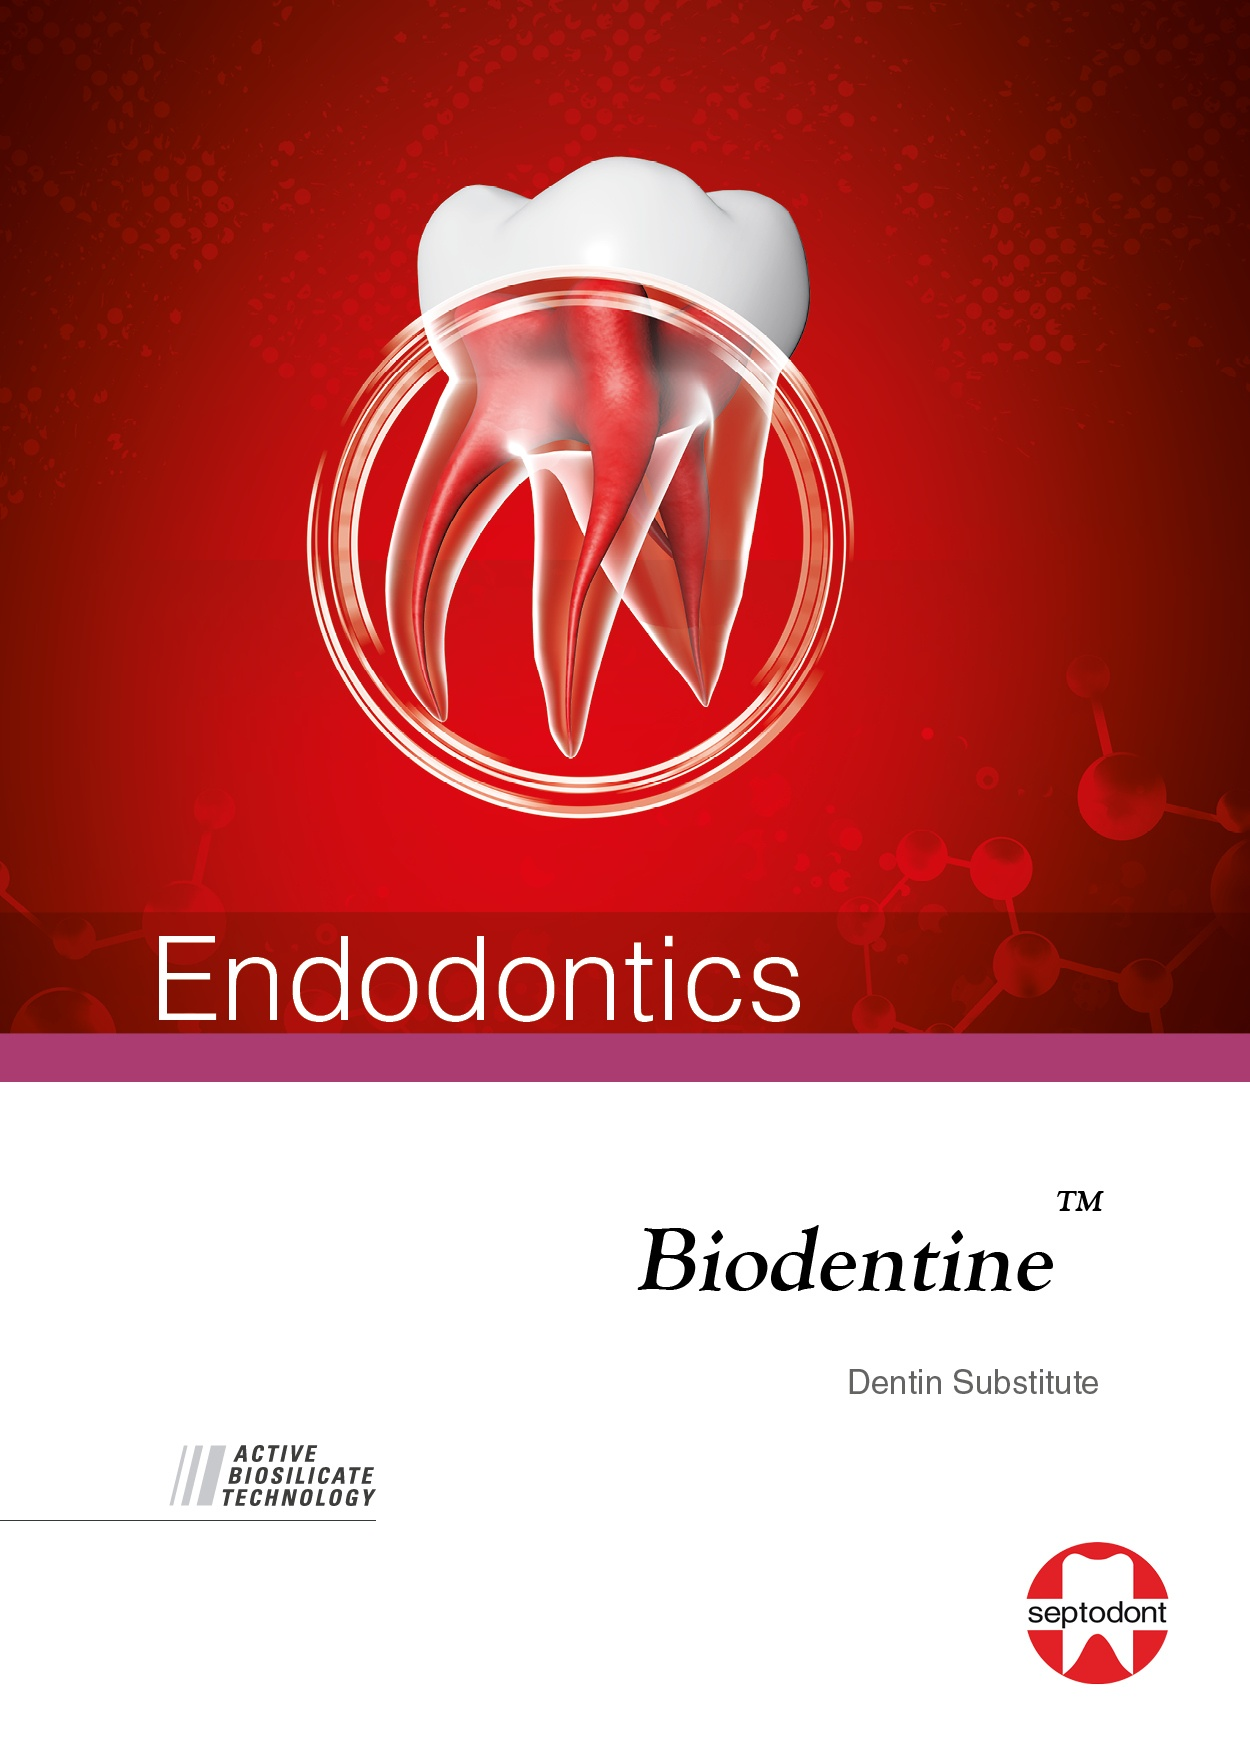 Biodentine Endodontics Brochure